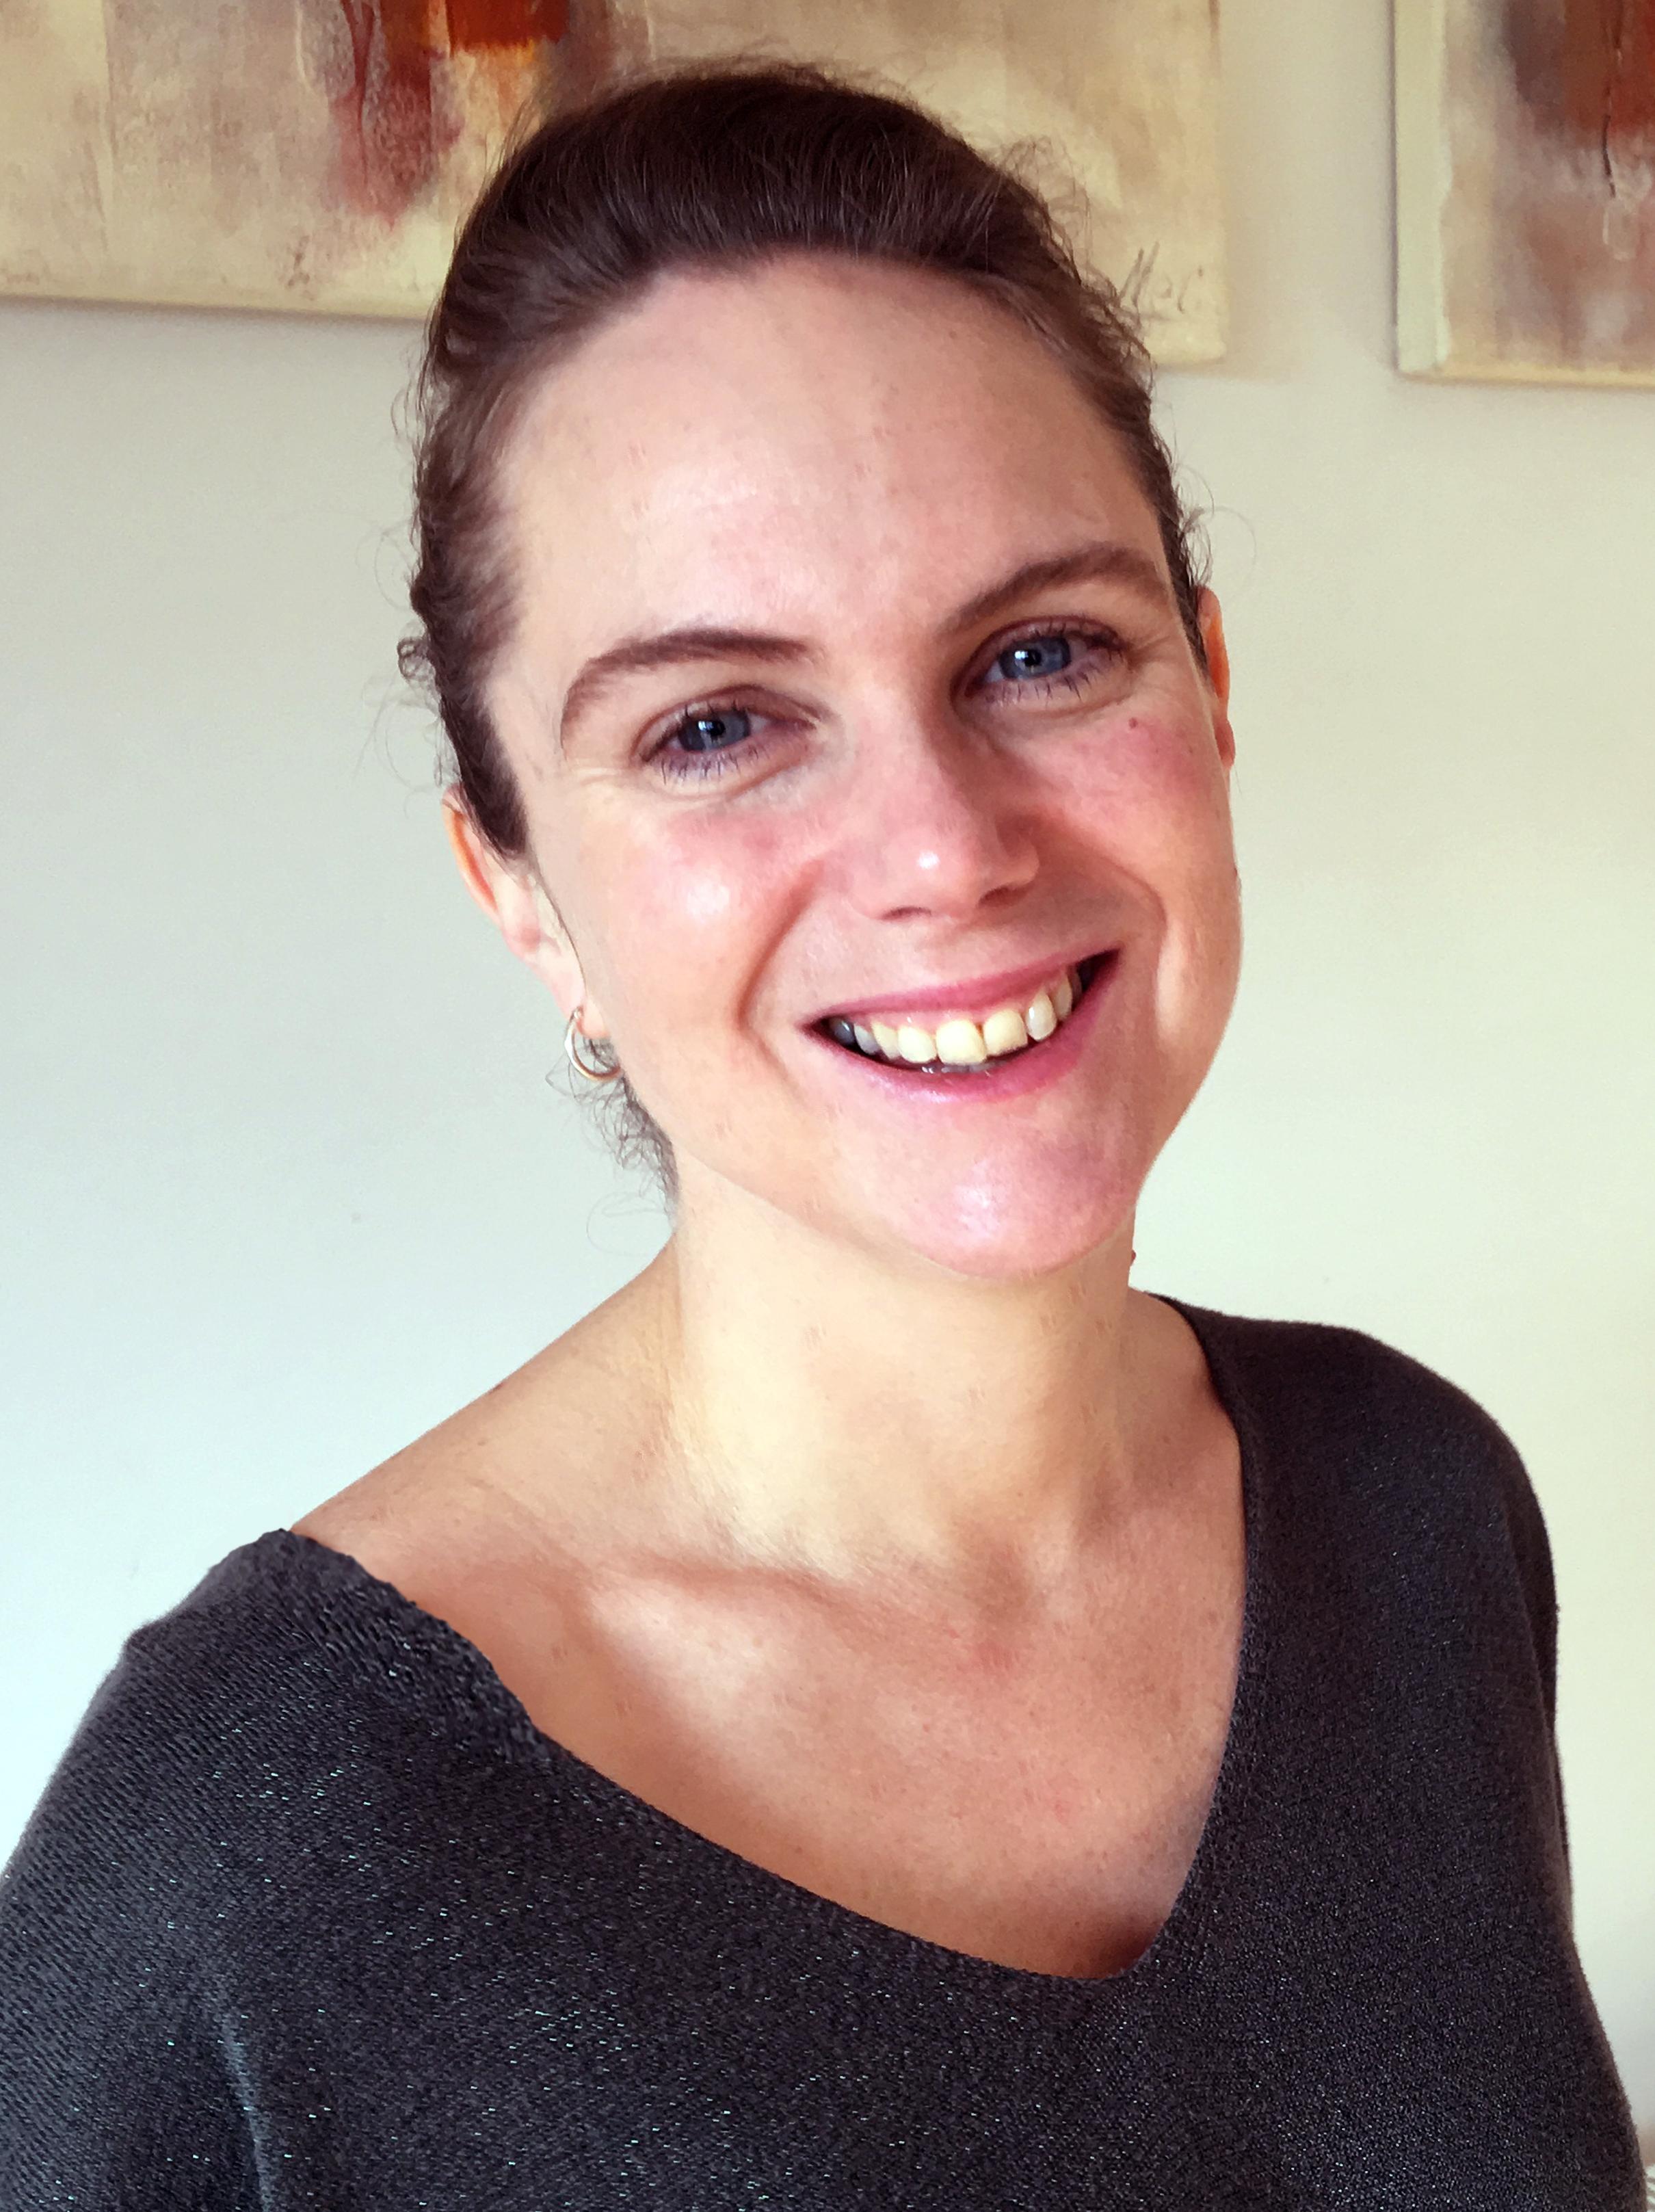 Ruth Olaynika